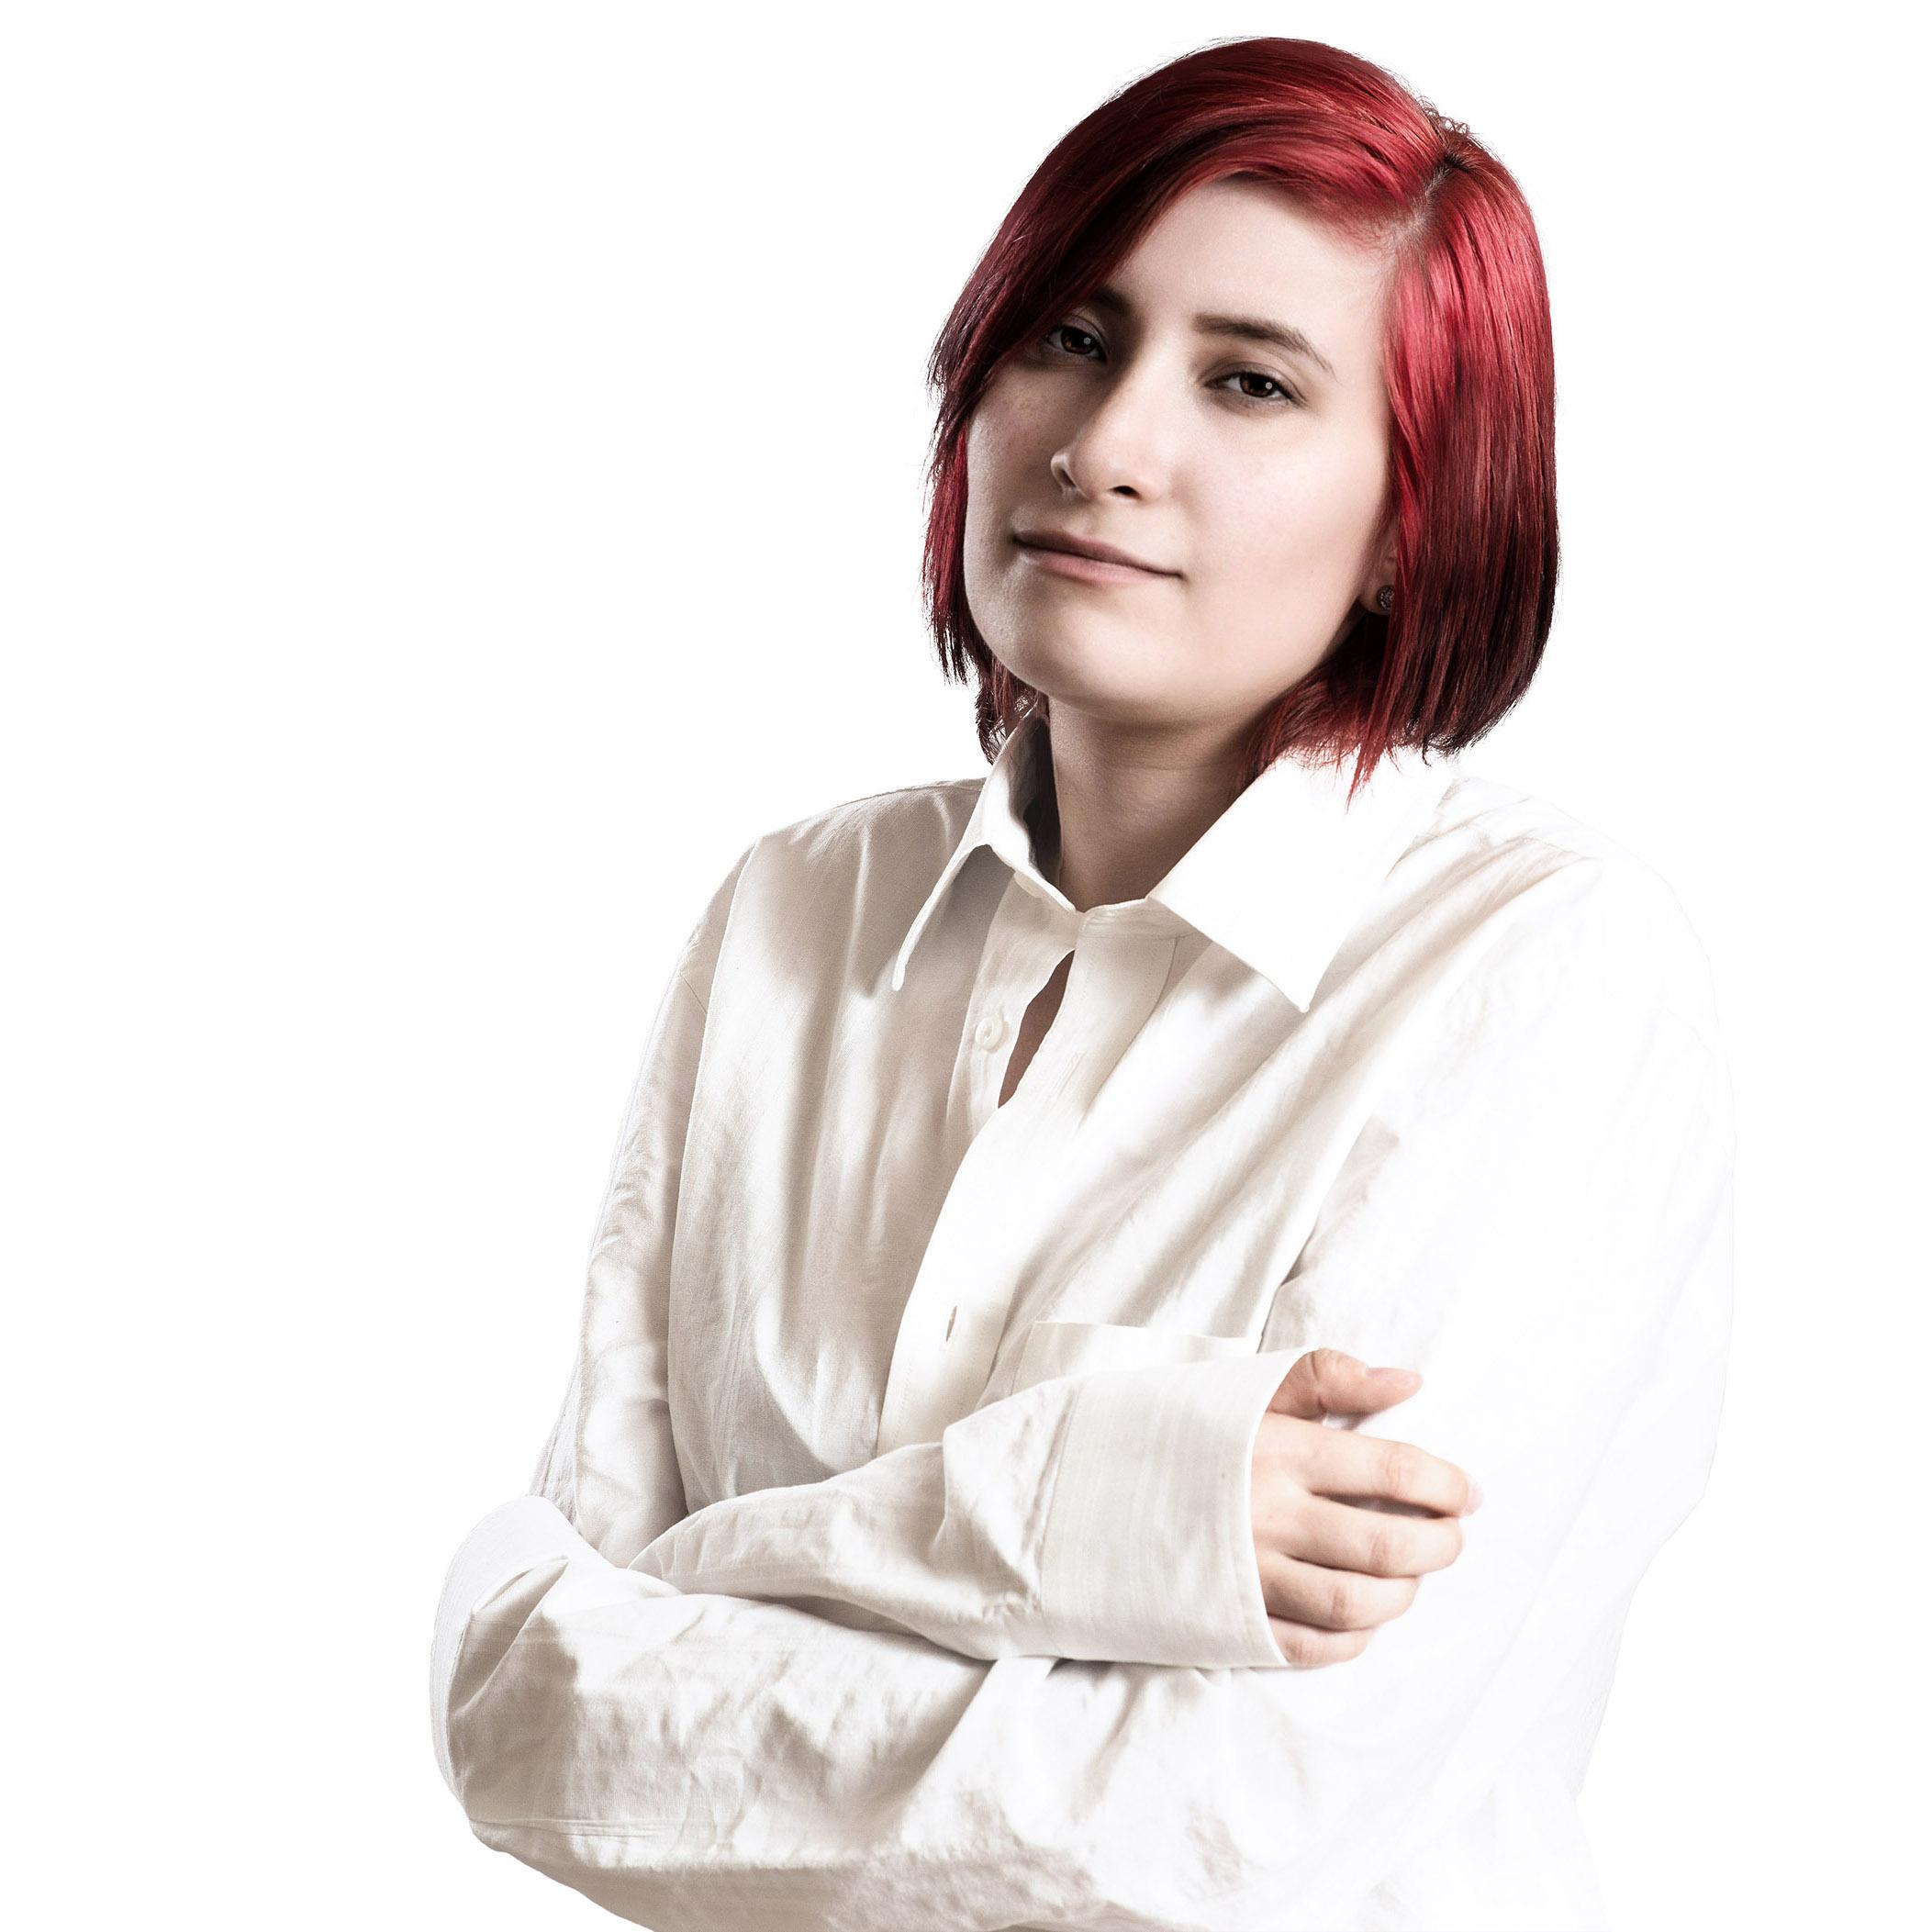 Ambers hair retouch 8459 30.jpg